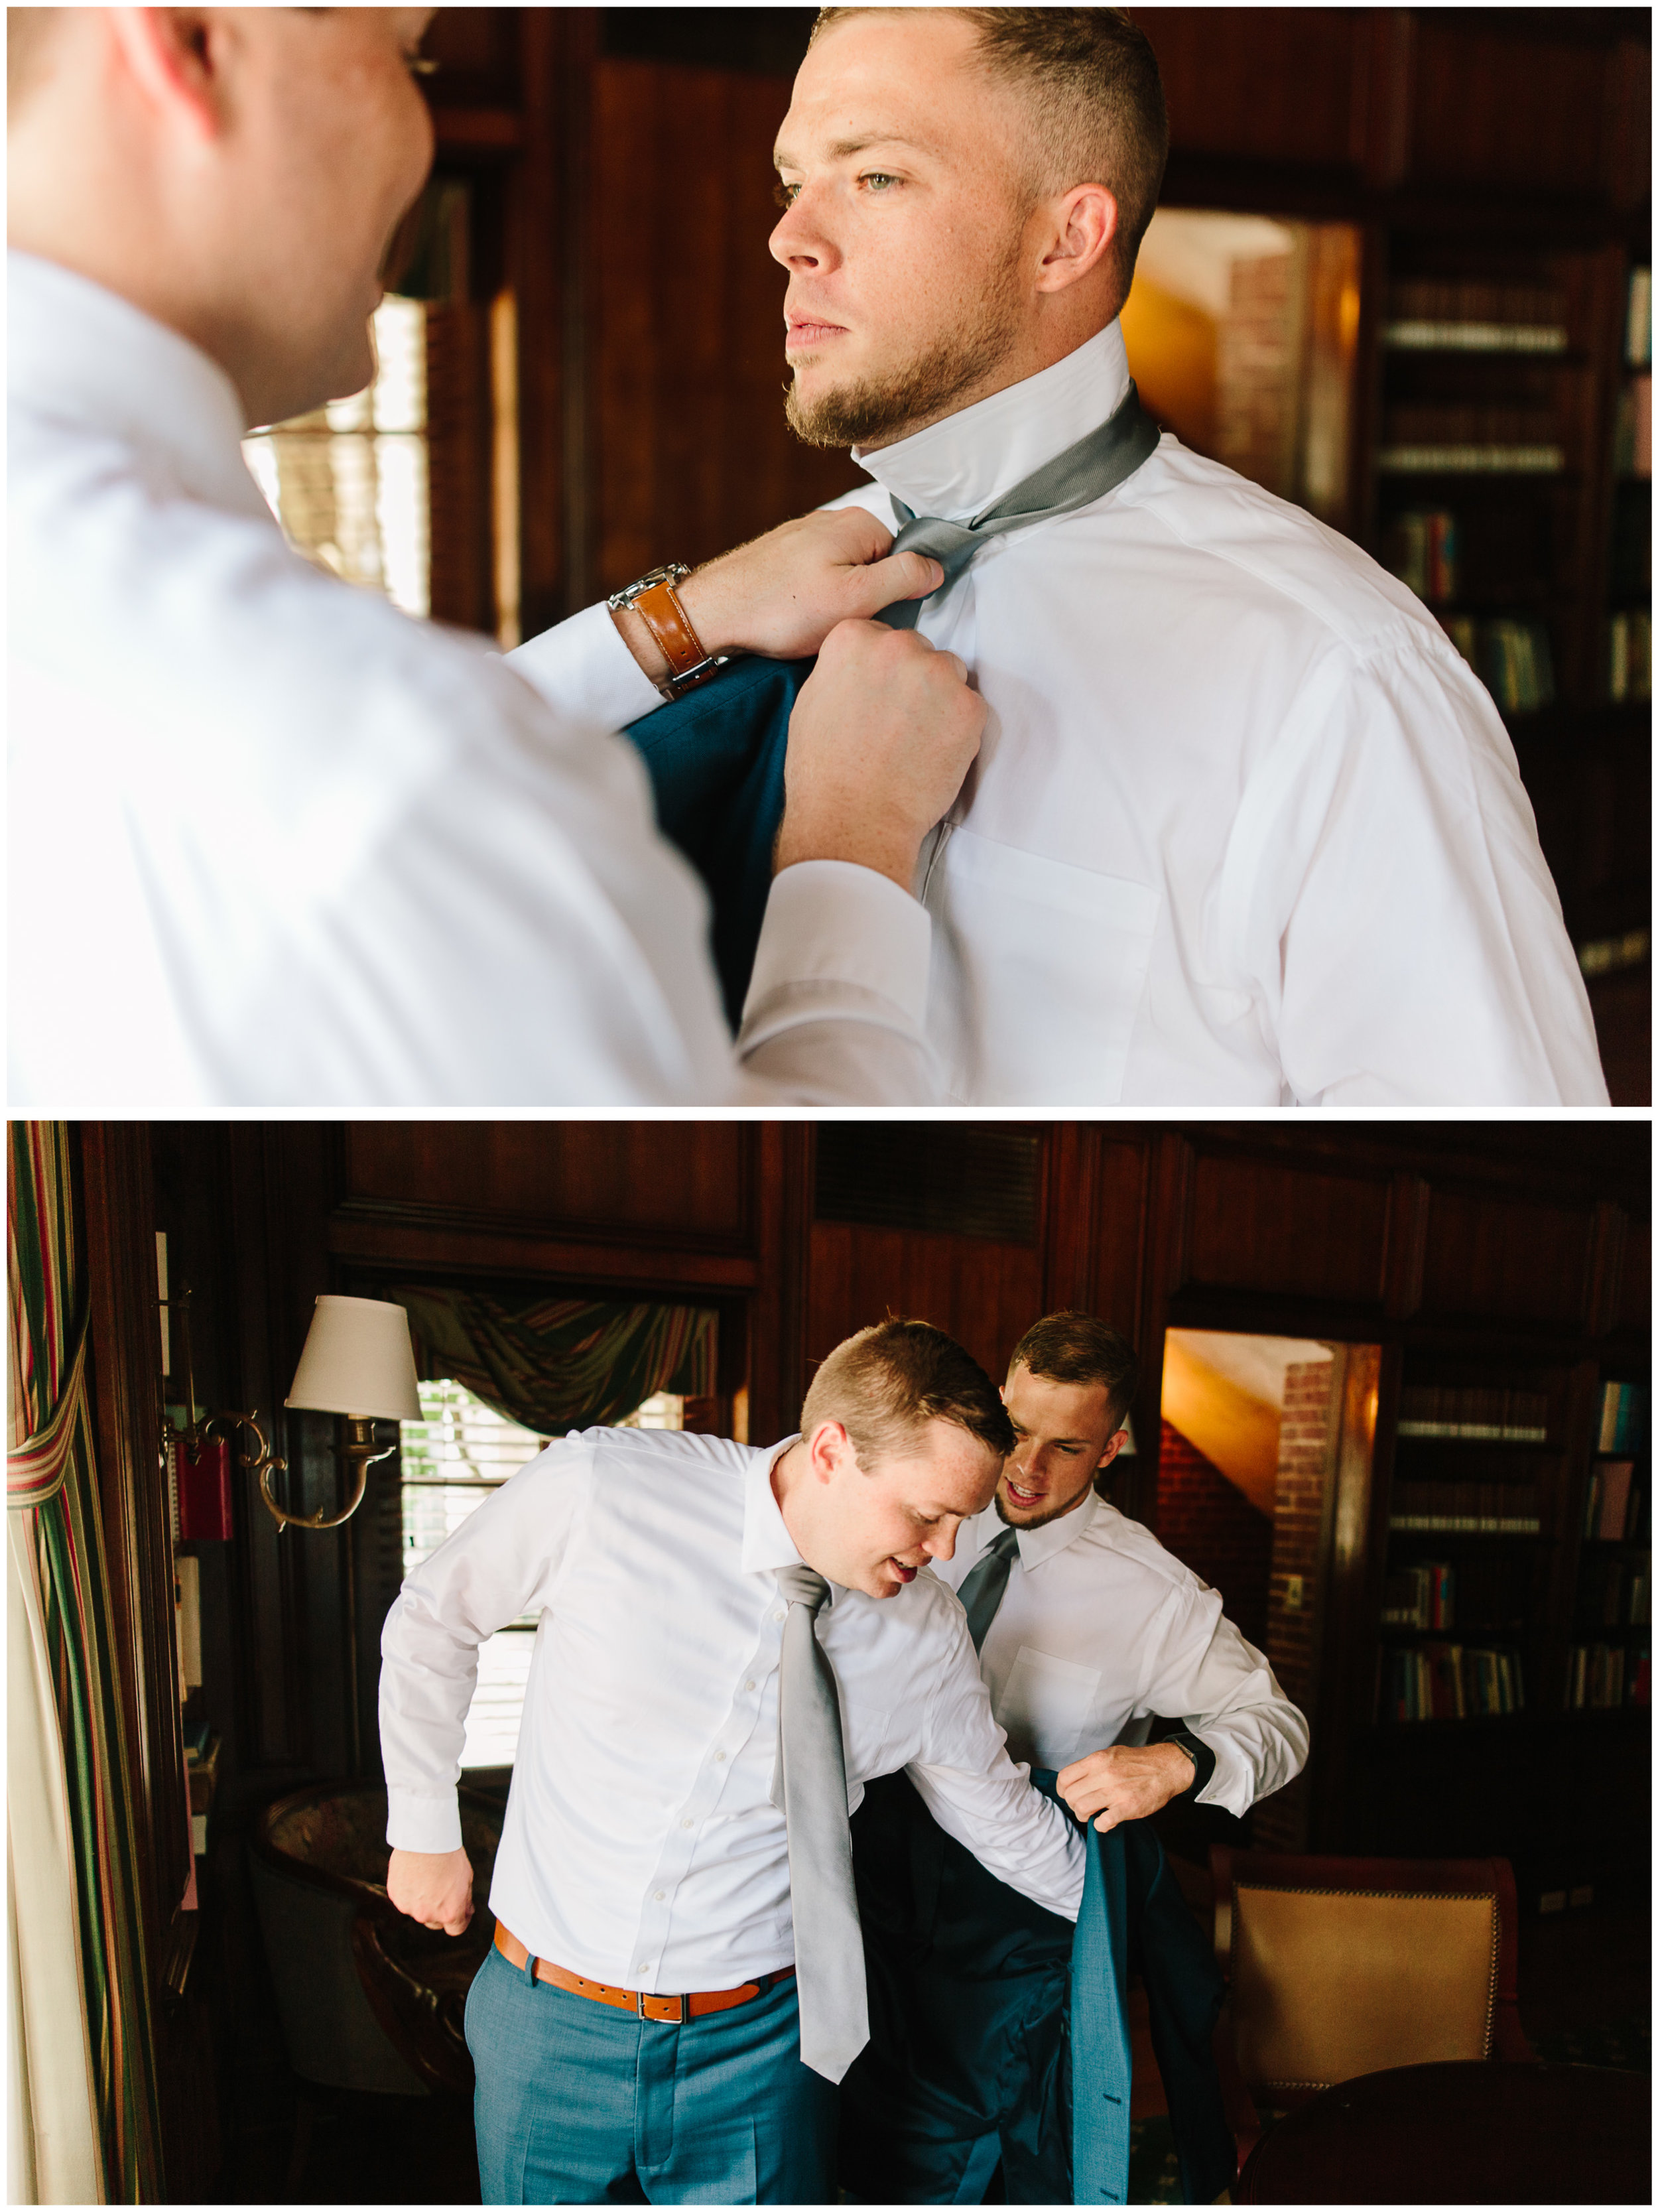 ann_arbor_michigan_wedding_25.jpg